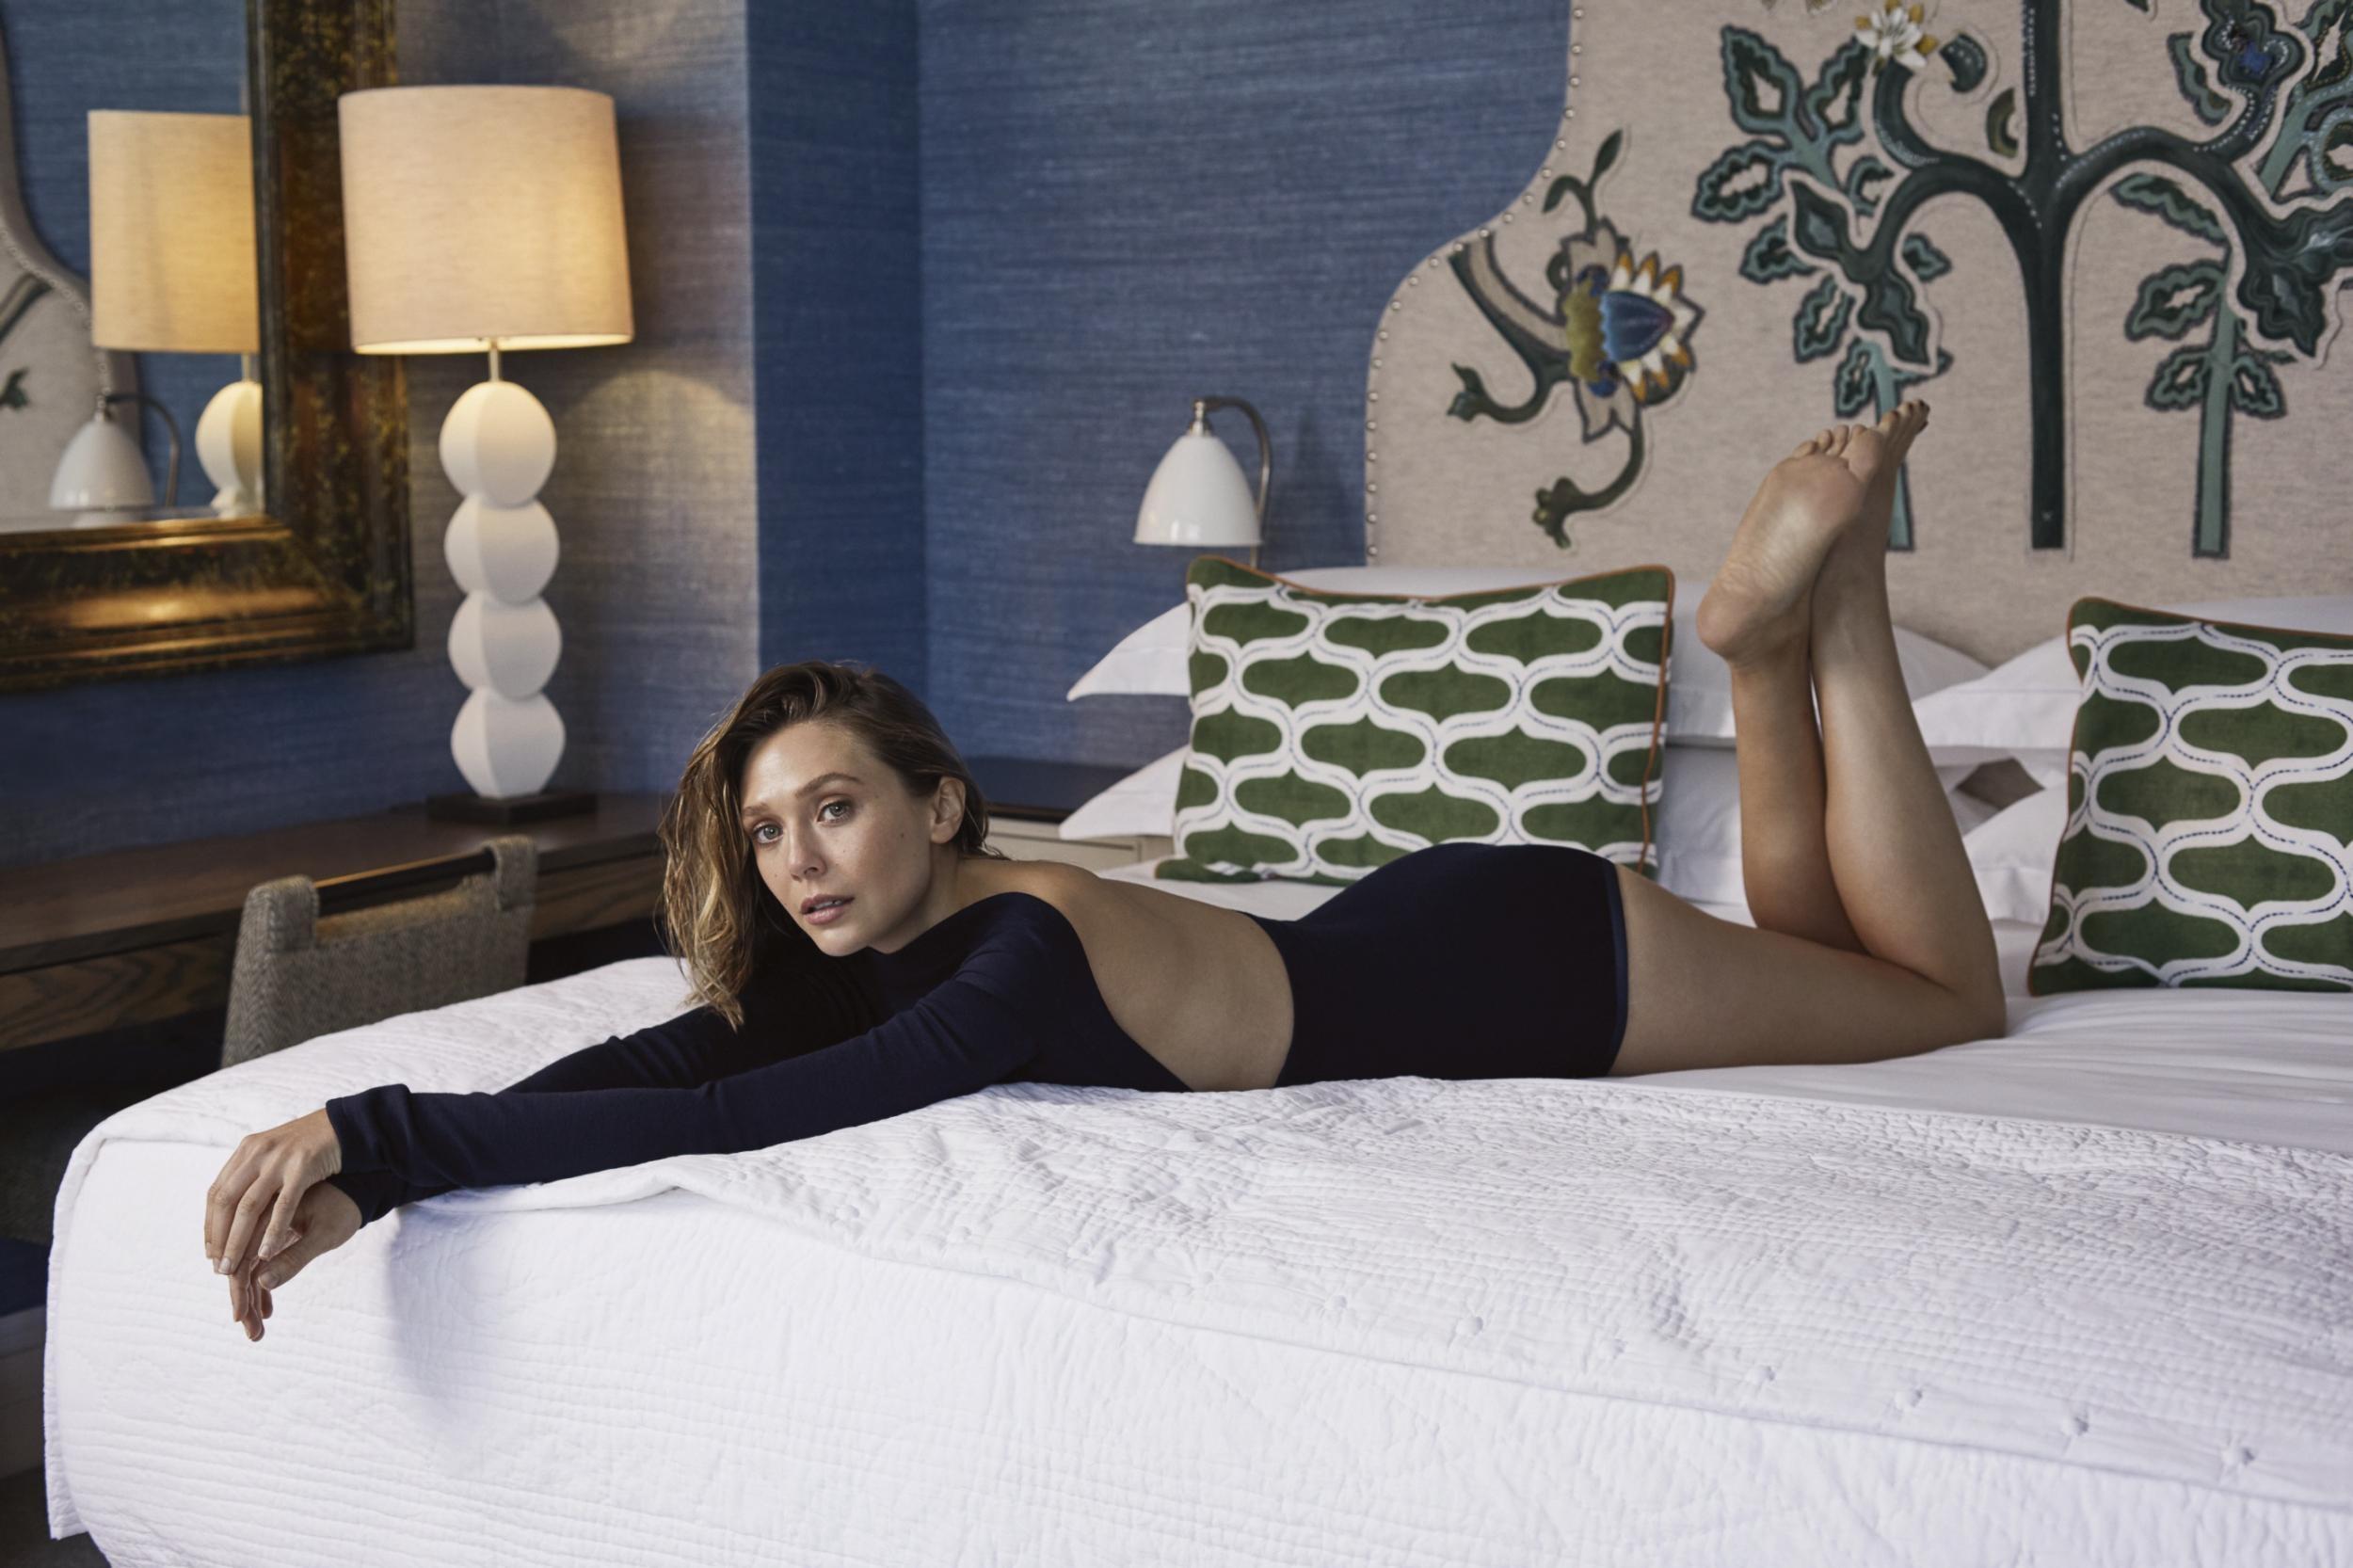 Hot Elizabeth Olsen Backless In Bed, Full Hd 2K Wallpaper-8114